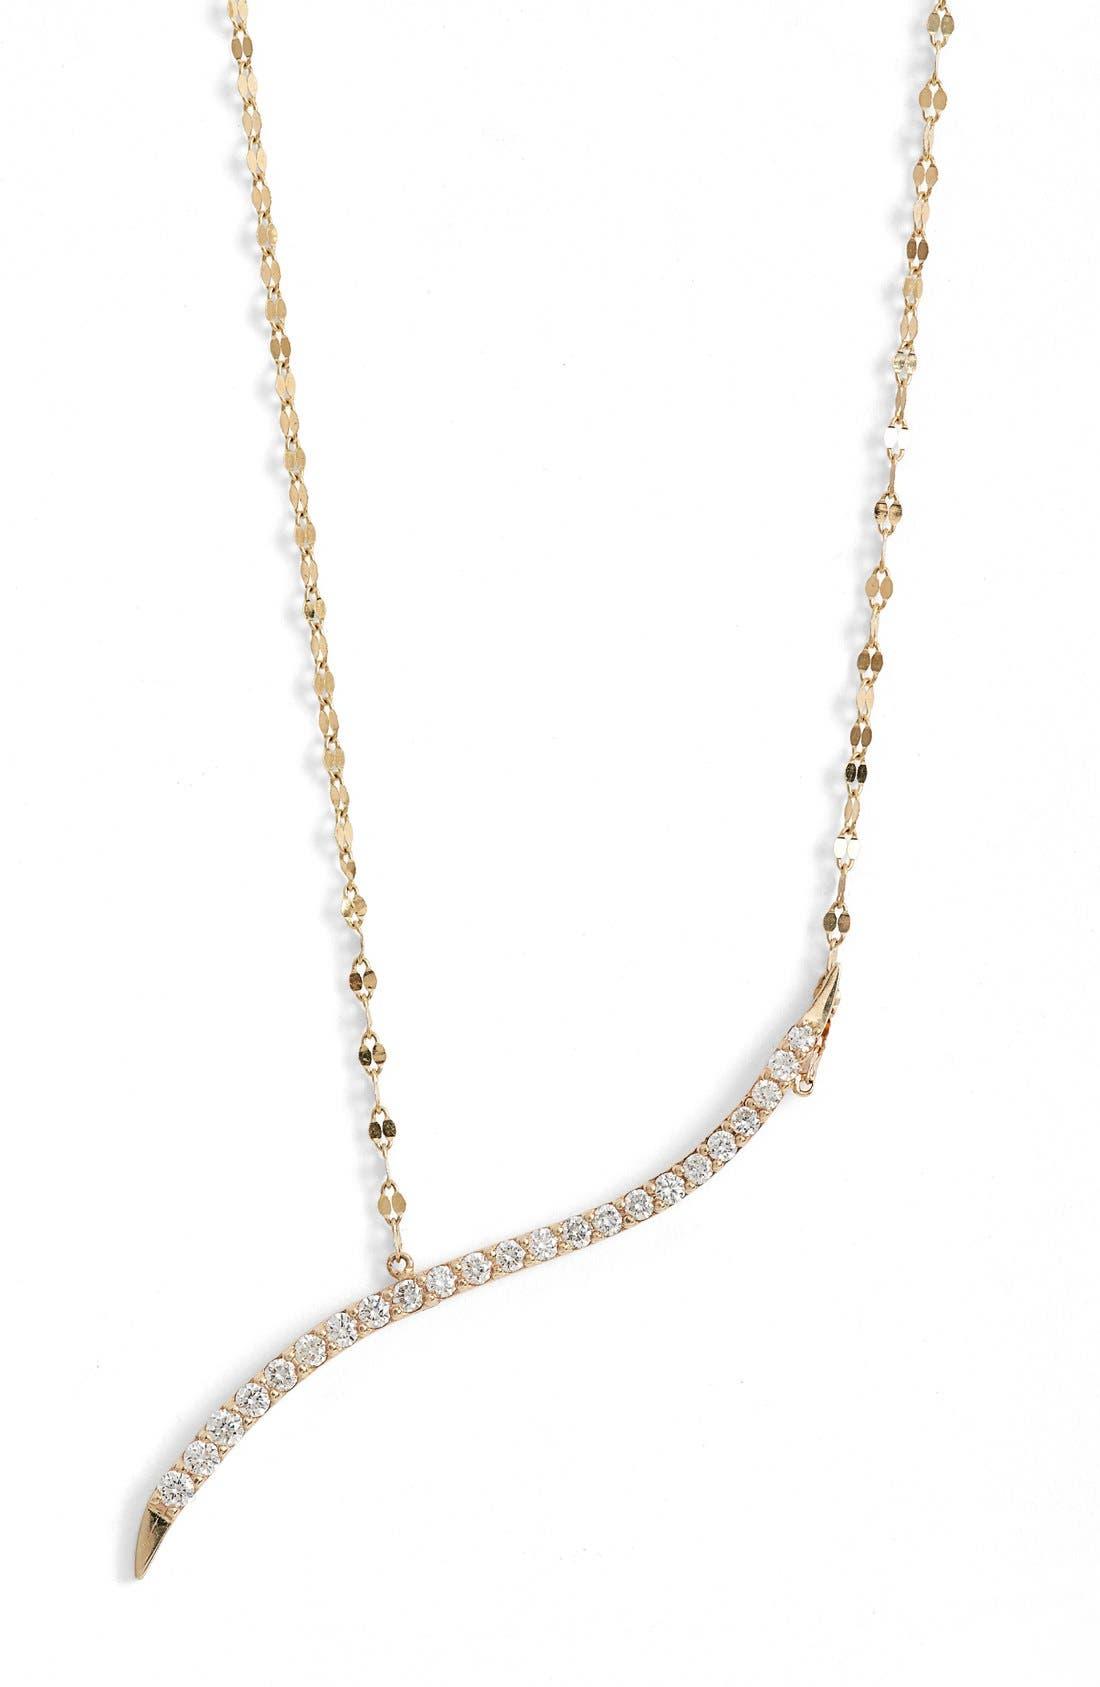 Alternate Image 1 Selected - Lana Jewelry 'Mirage' Diamond Pendant Necklace